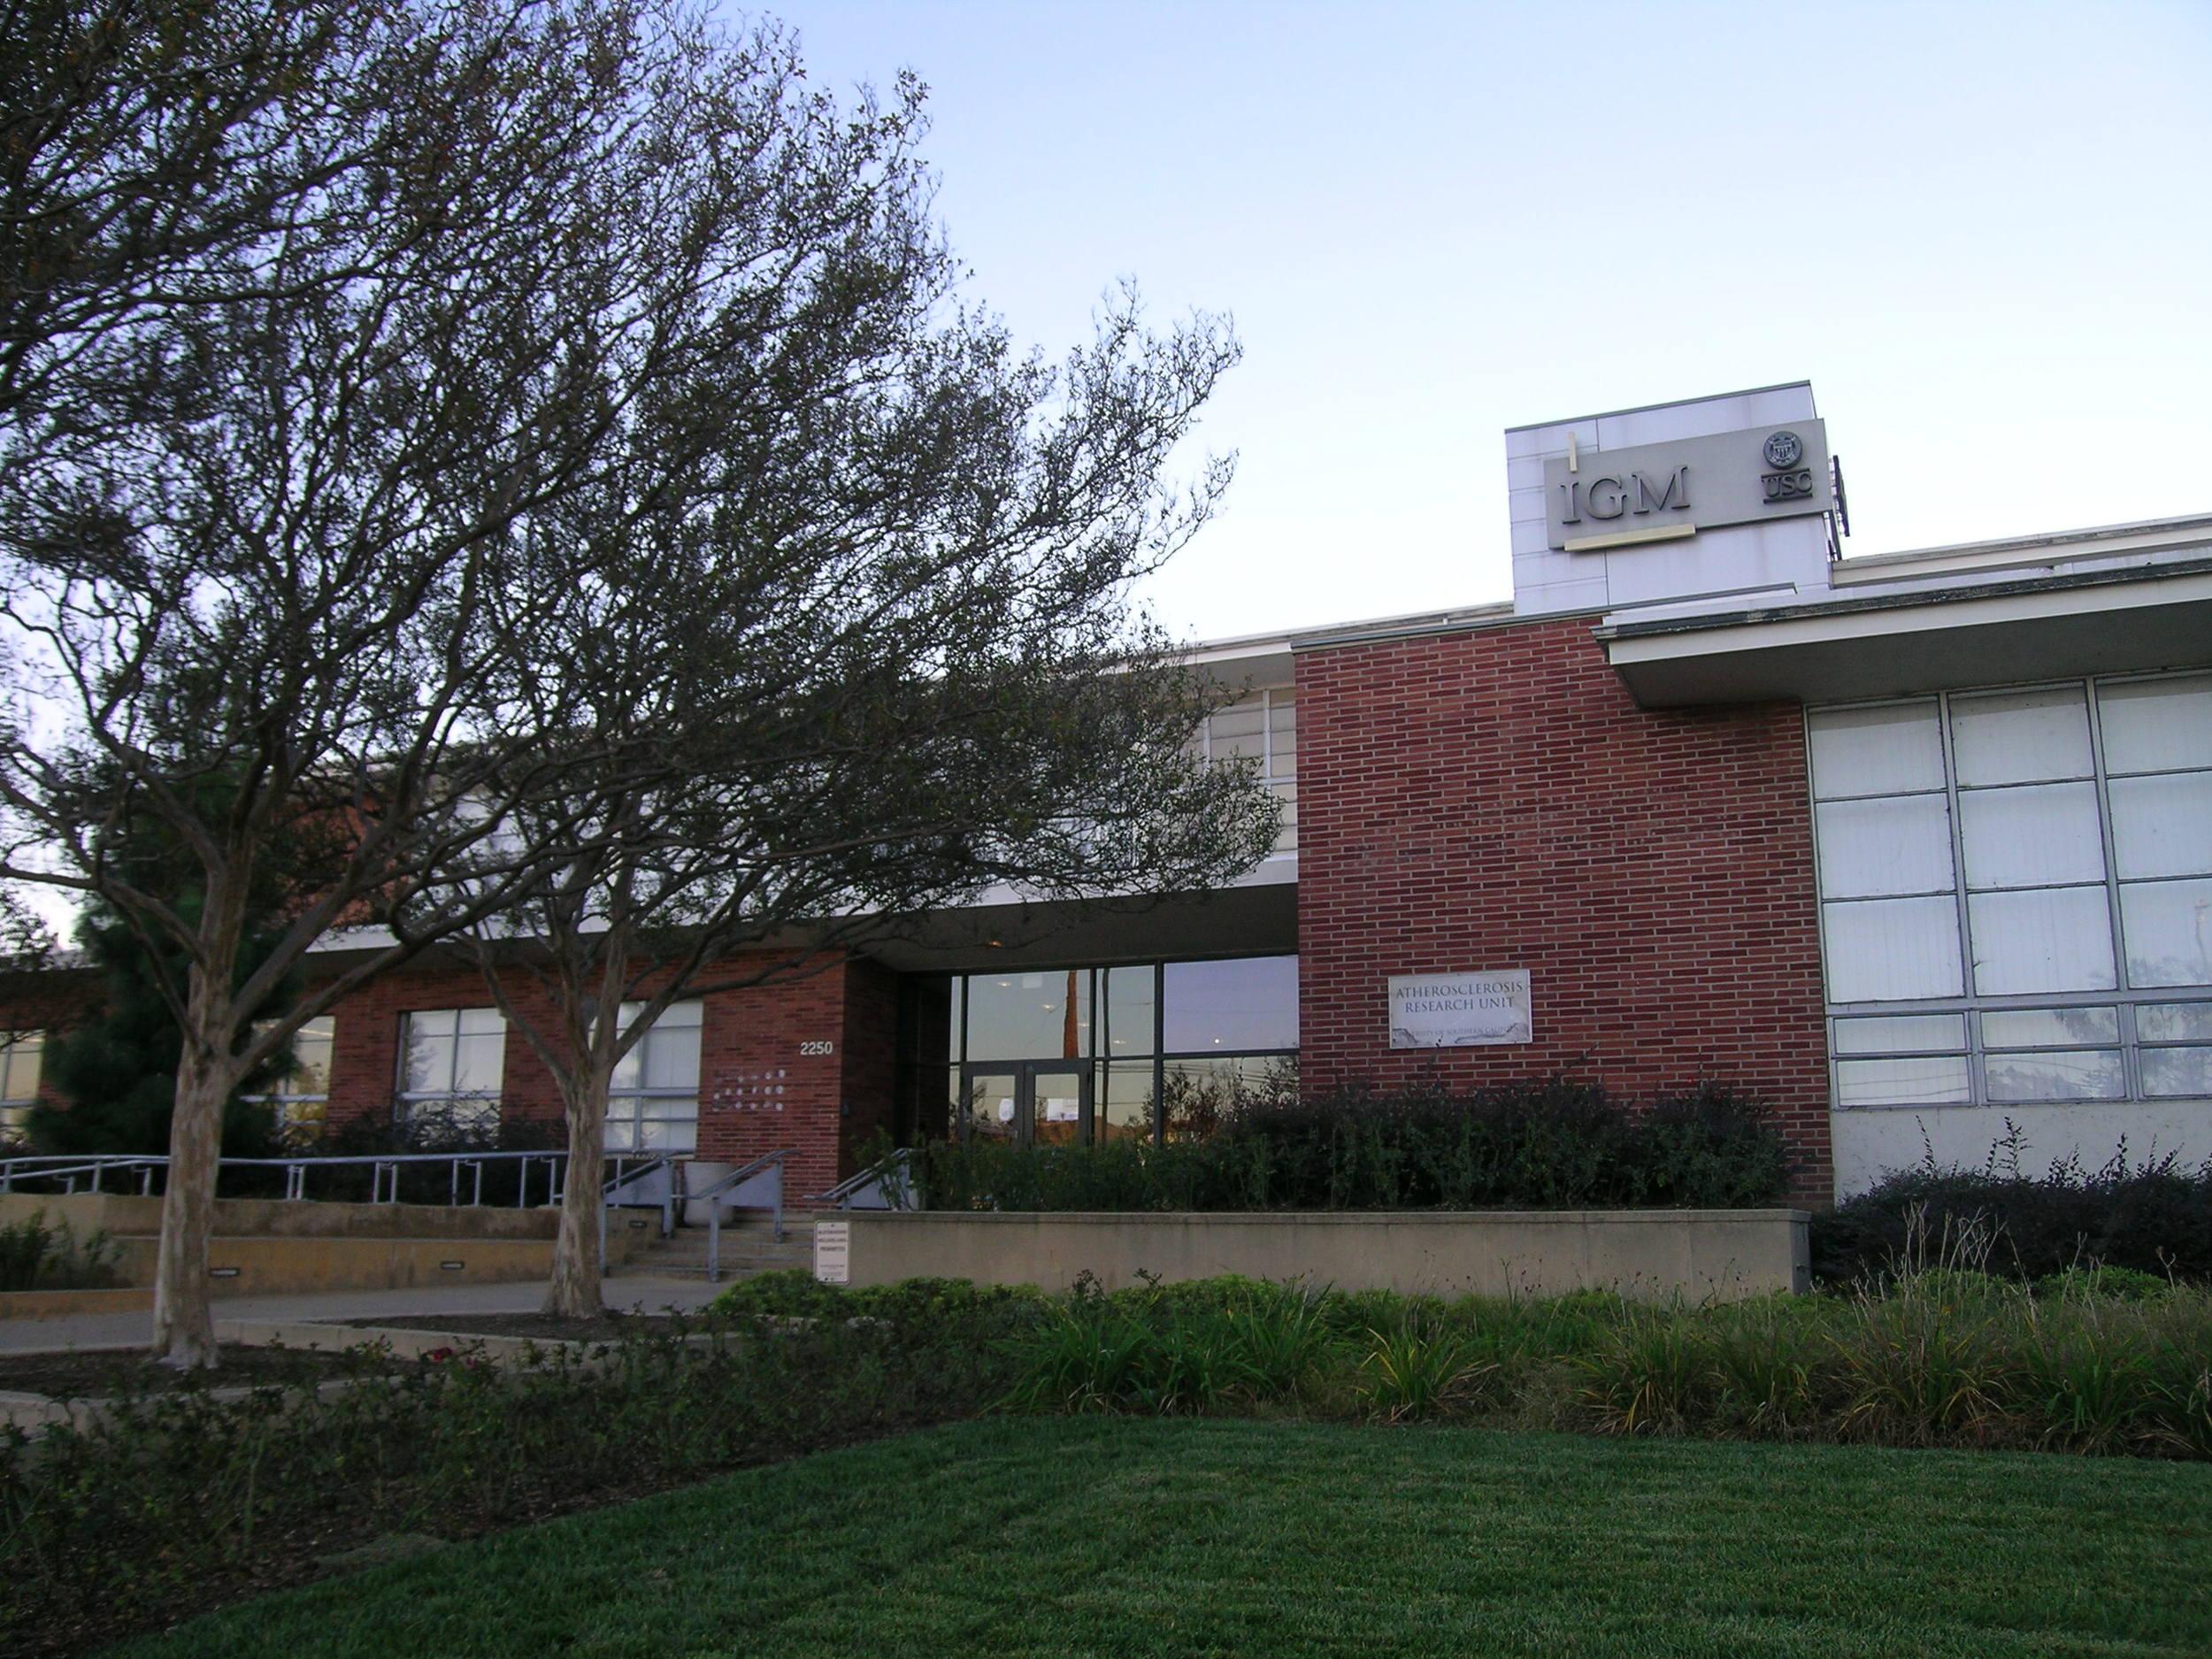 USC Health Sciences Campus Clinical Sciences Center